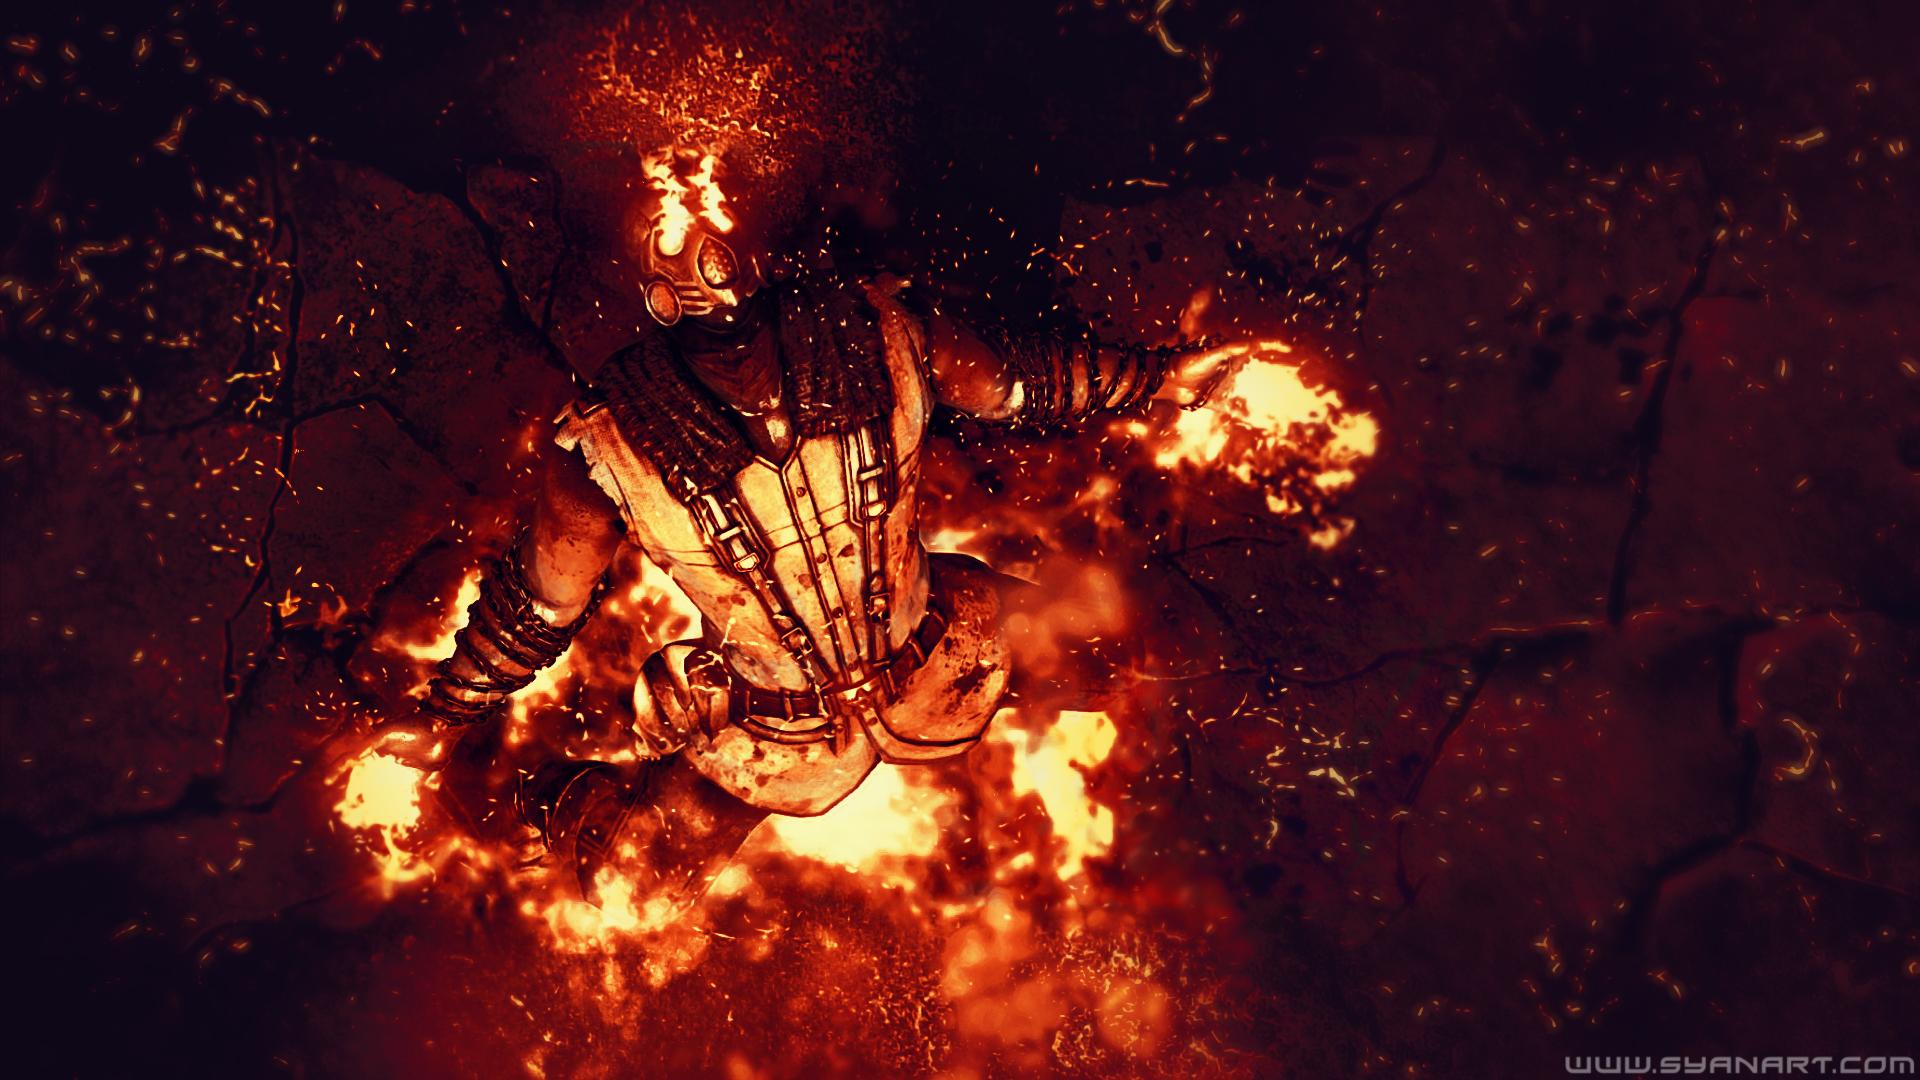 Wallpapers Mortal Kombat X Posted By Ryan Walker